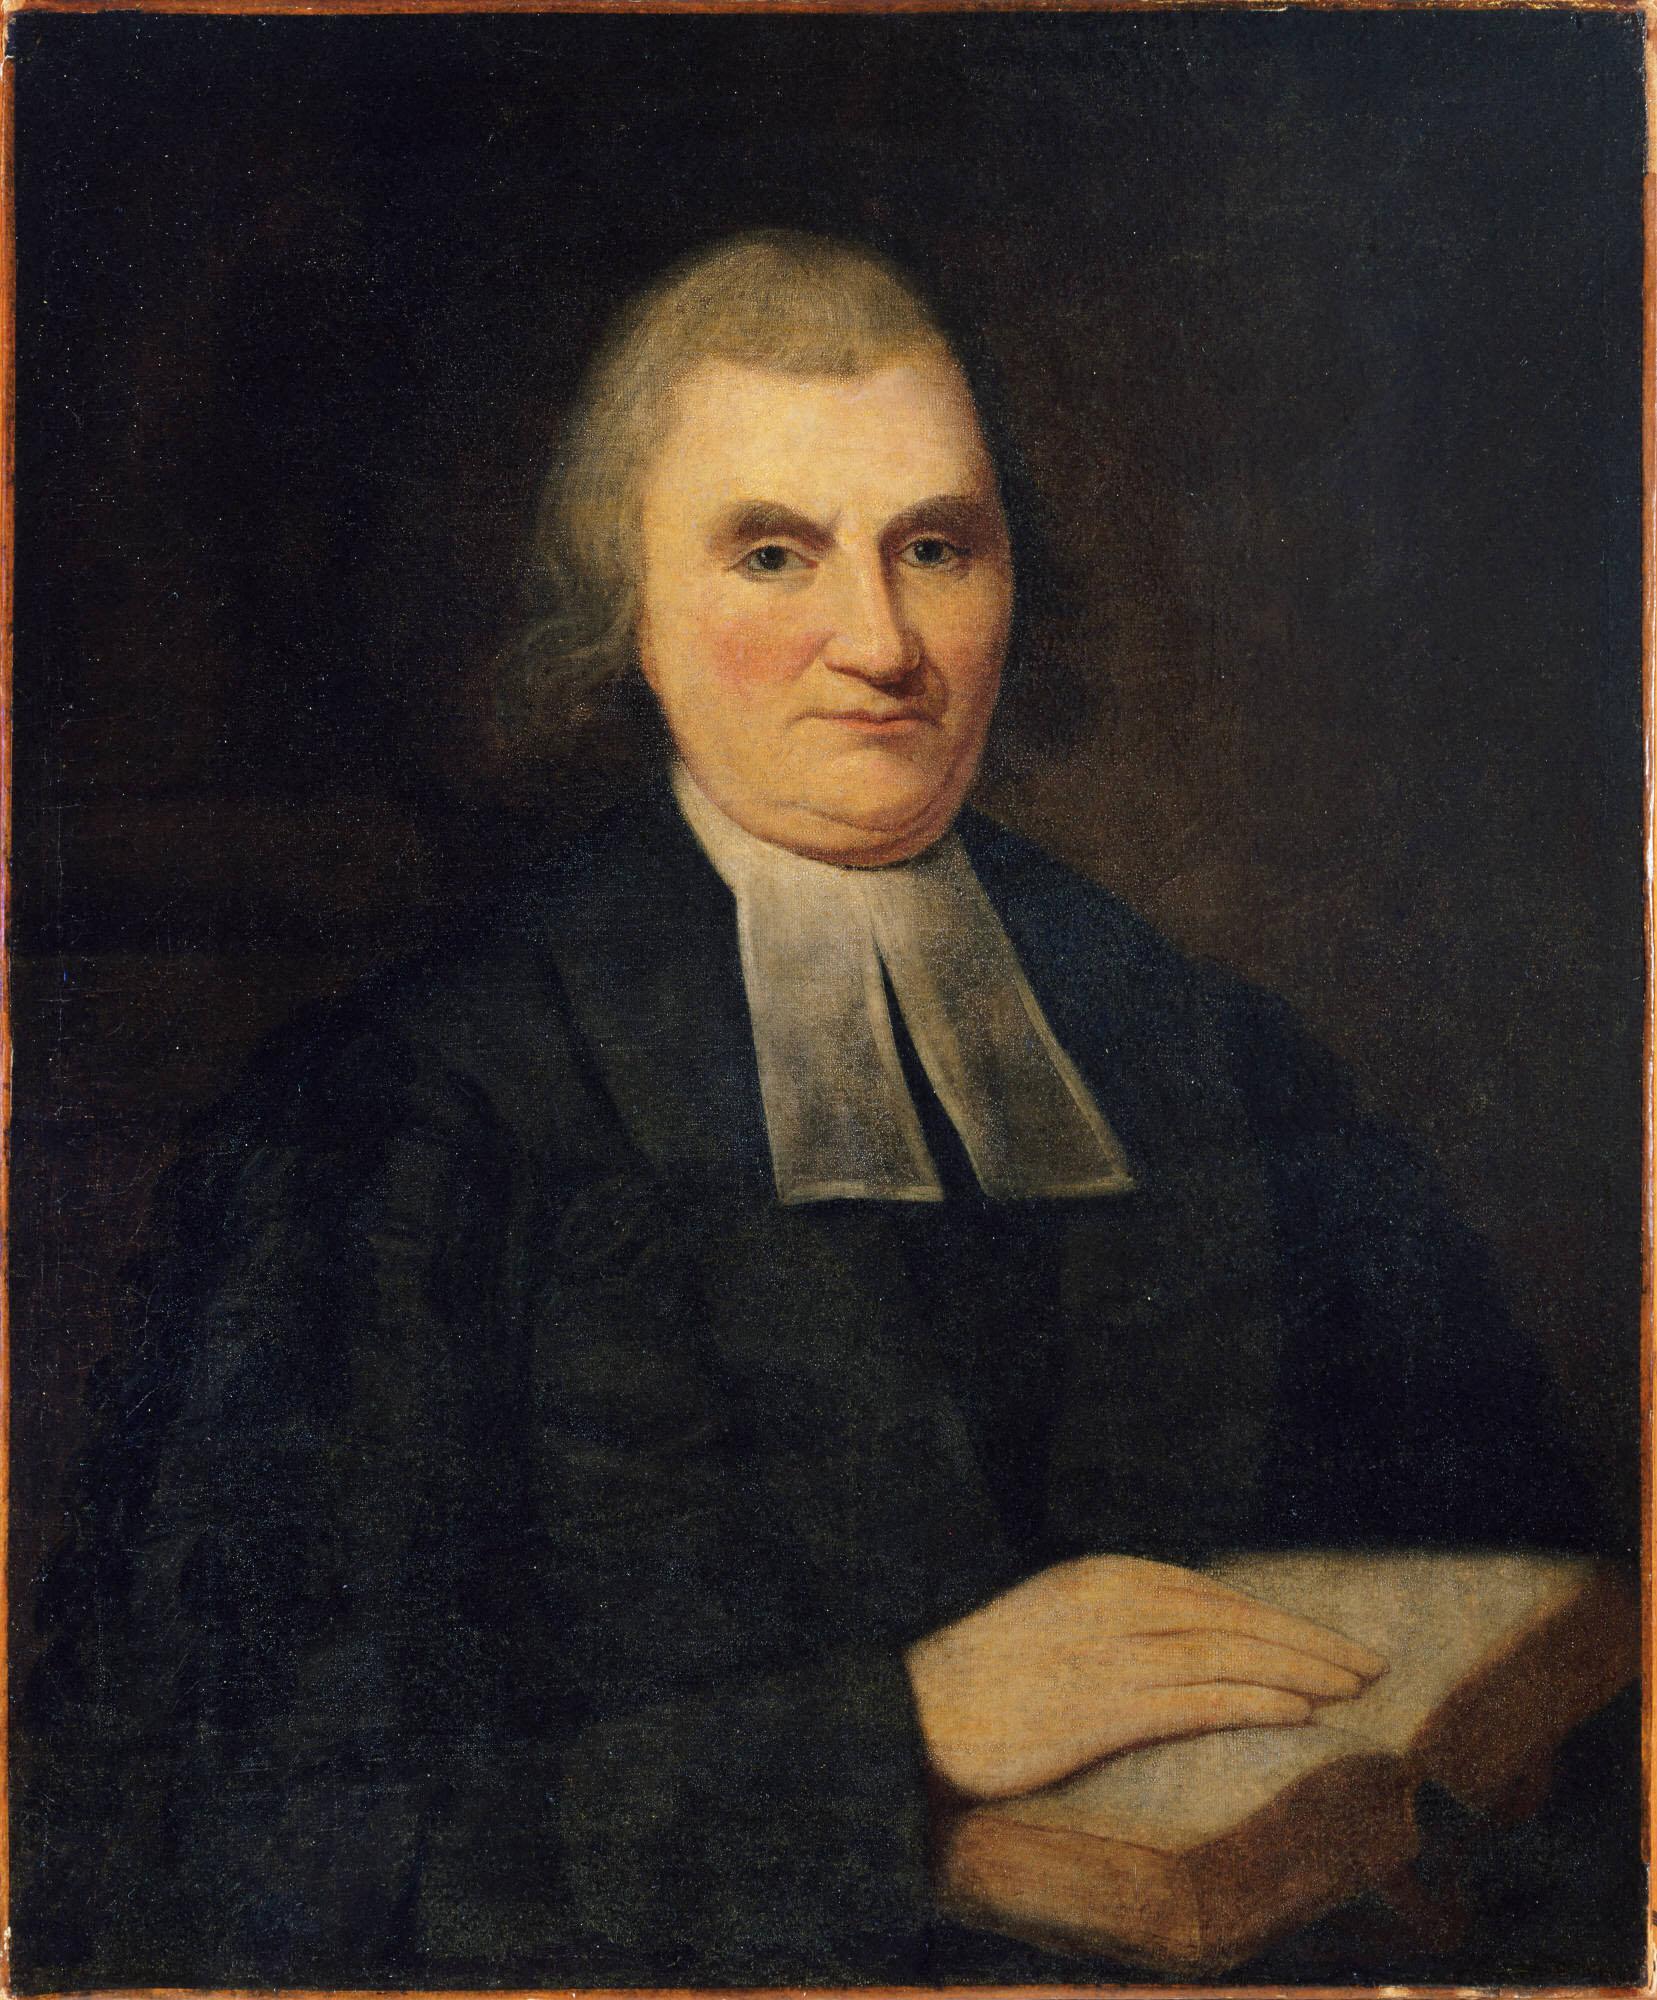 John Witherspoon Wikipedia